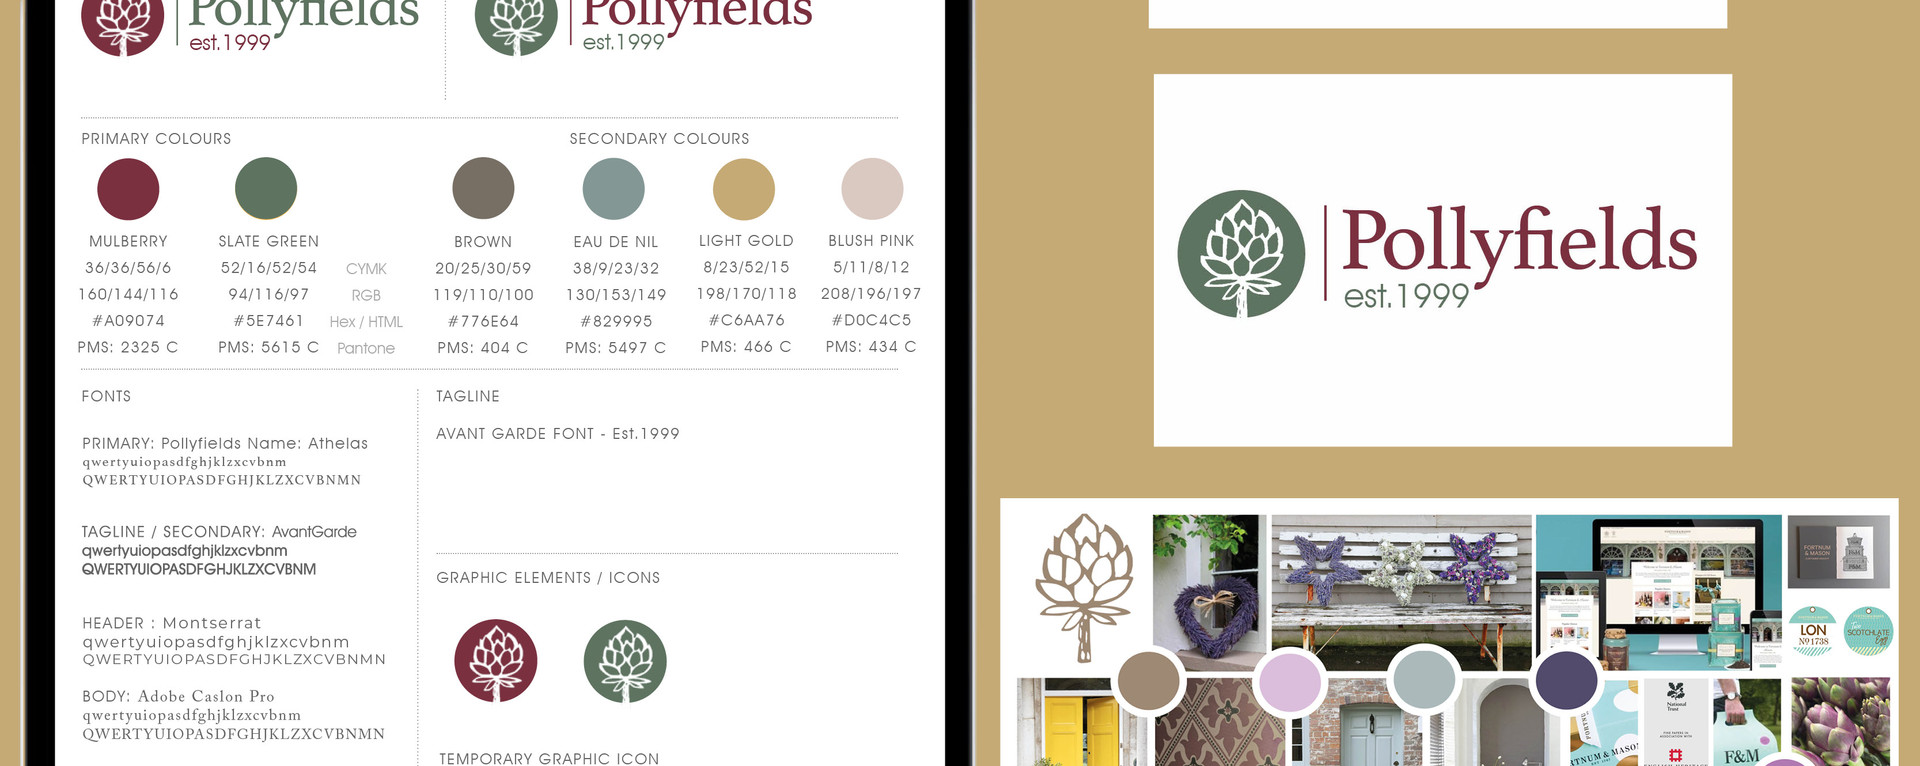 POLLYFIELDS.BRAND REFRESH | POLYFIELDS